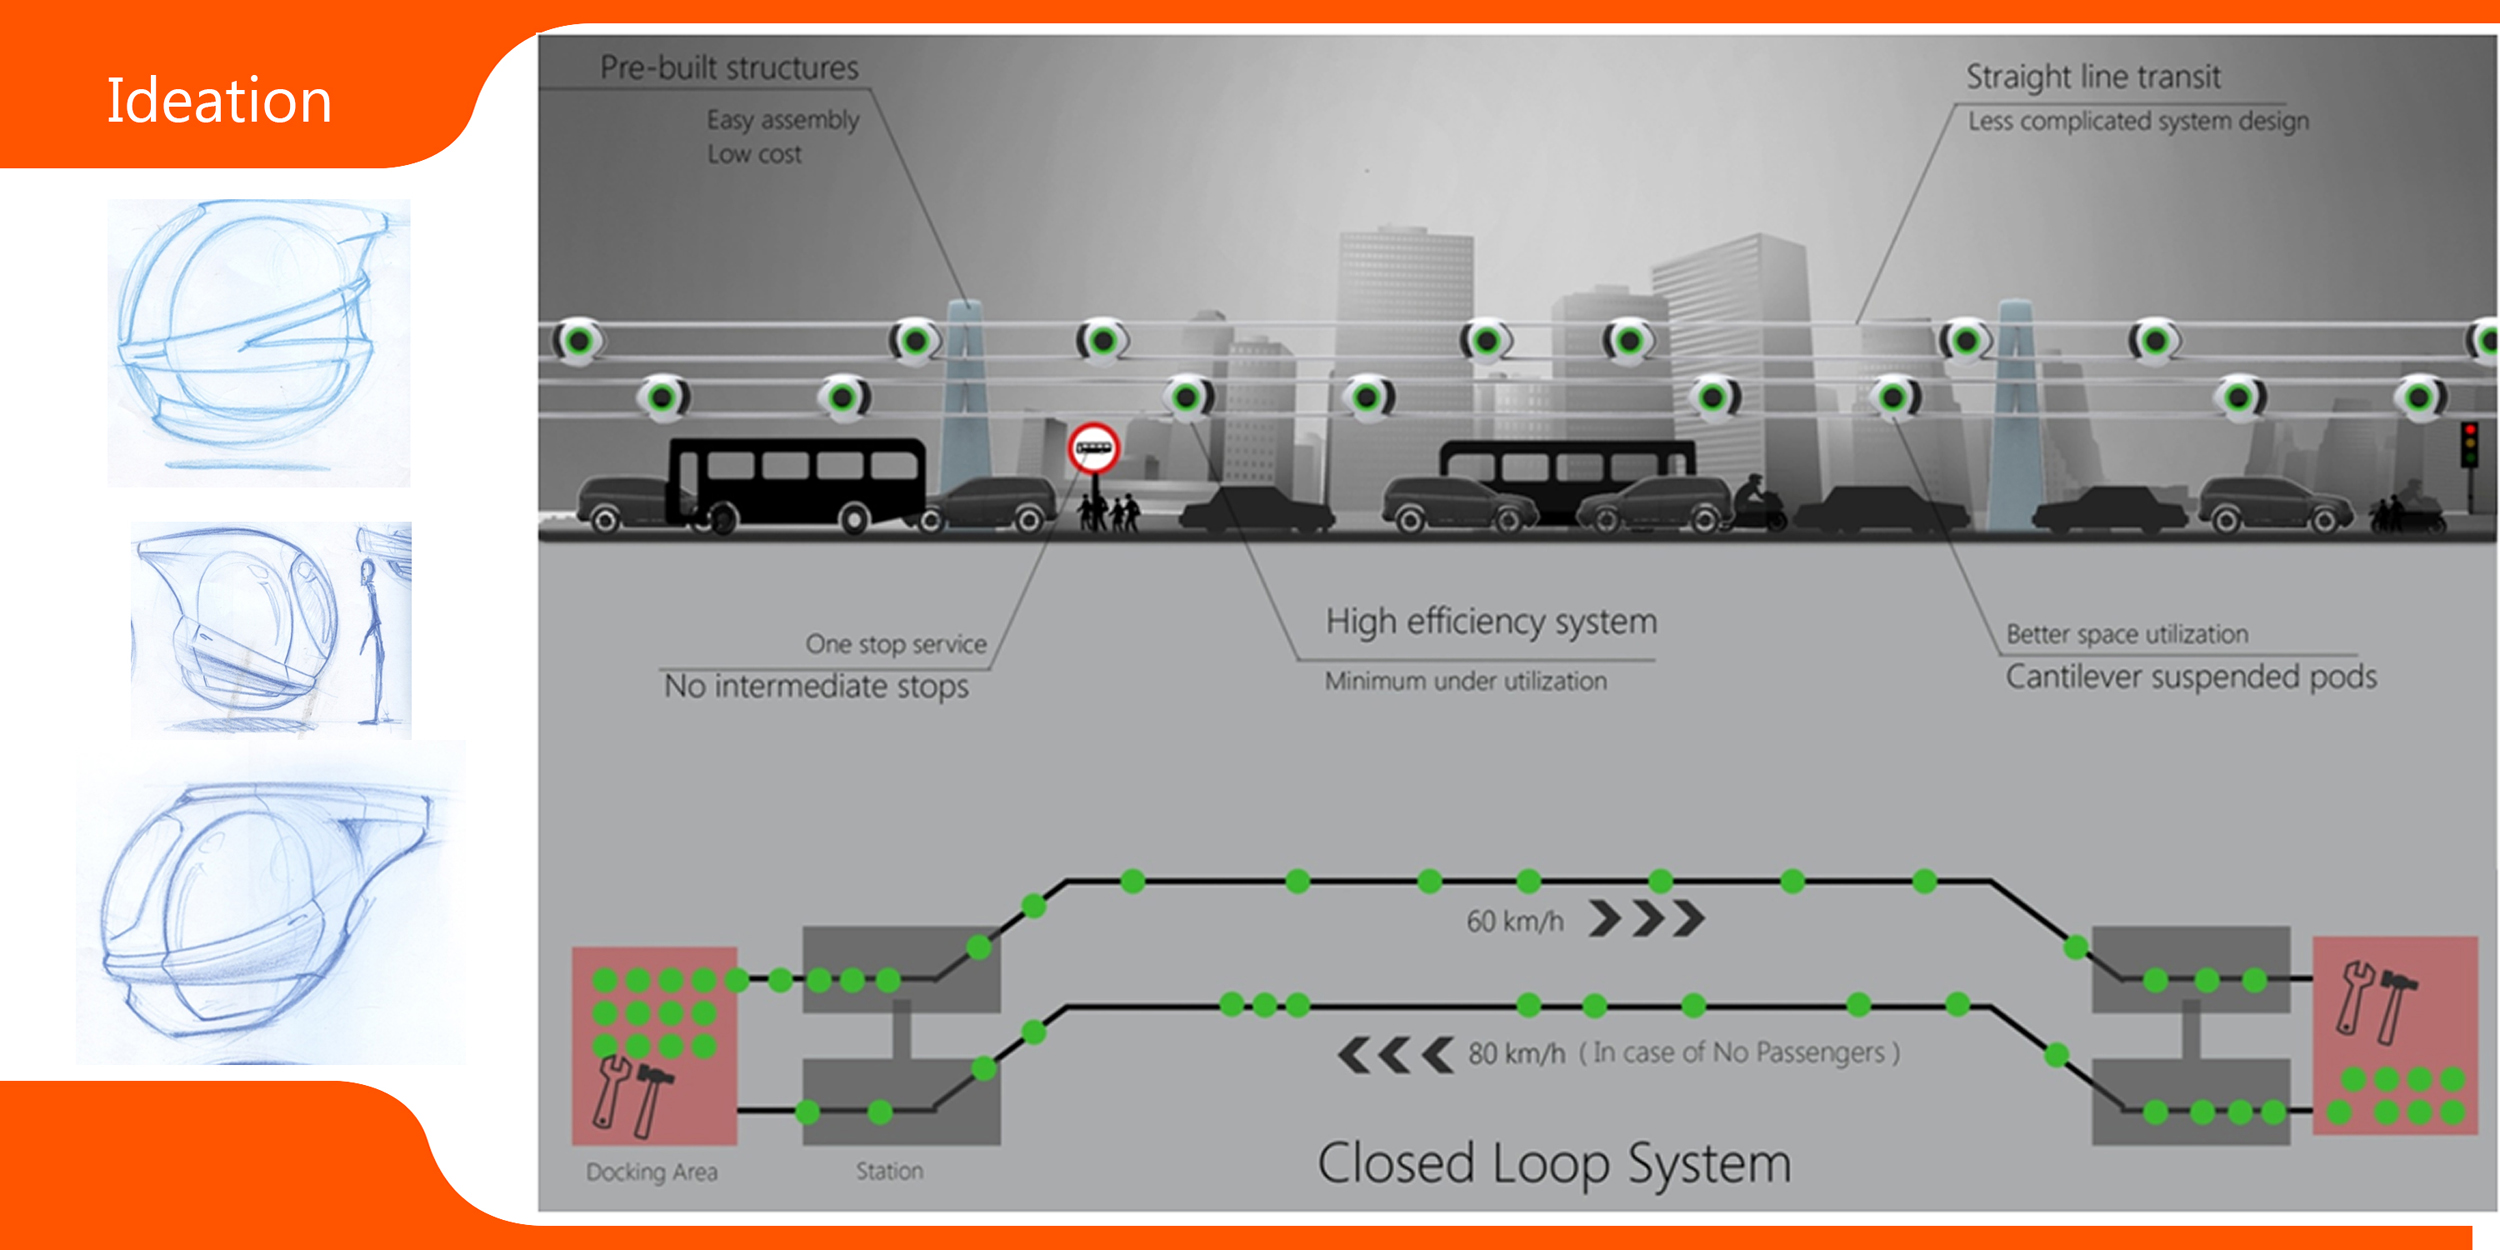 public-transport-system-for-2030-concept-large6